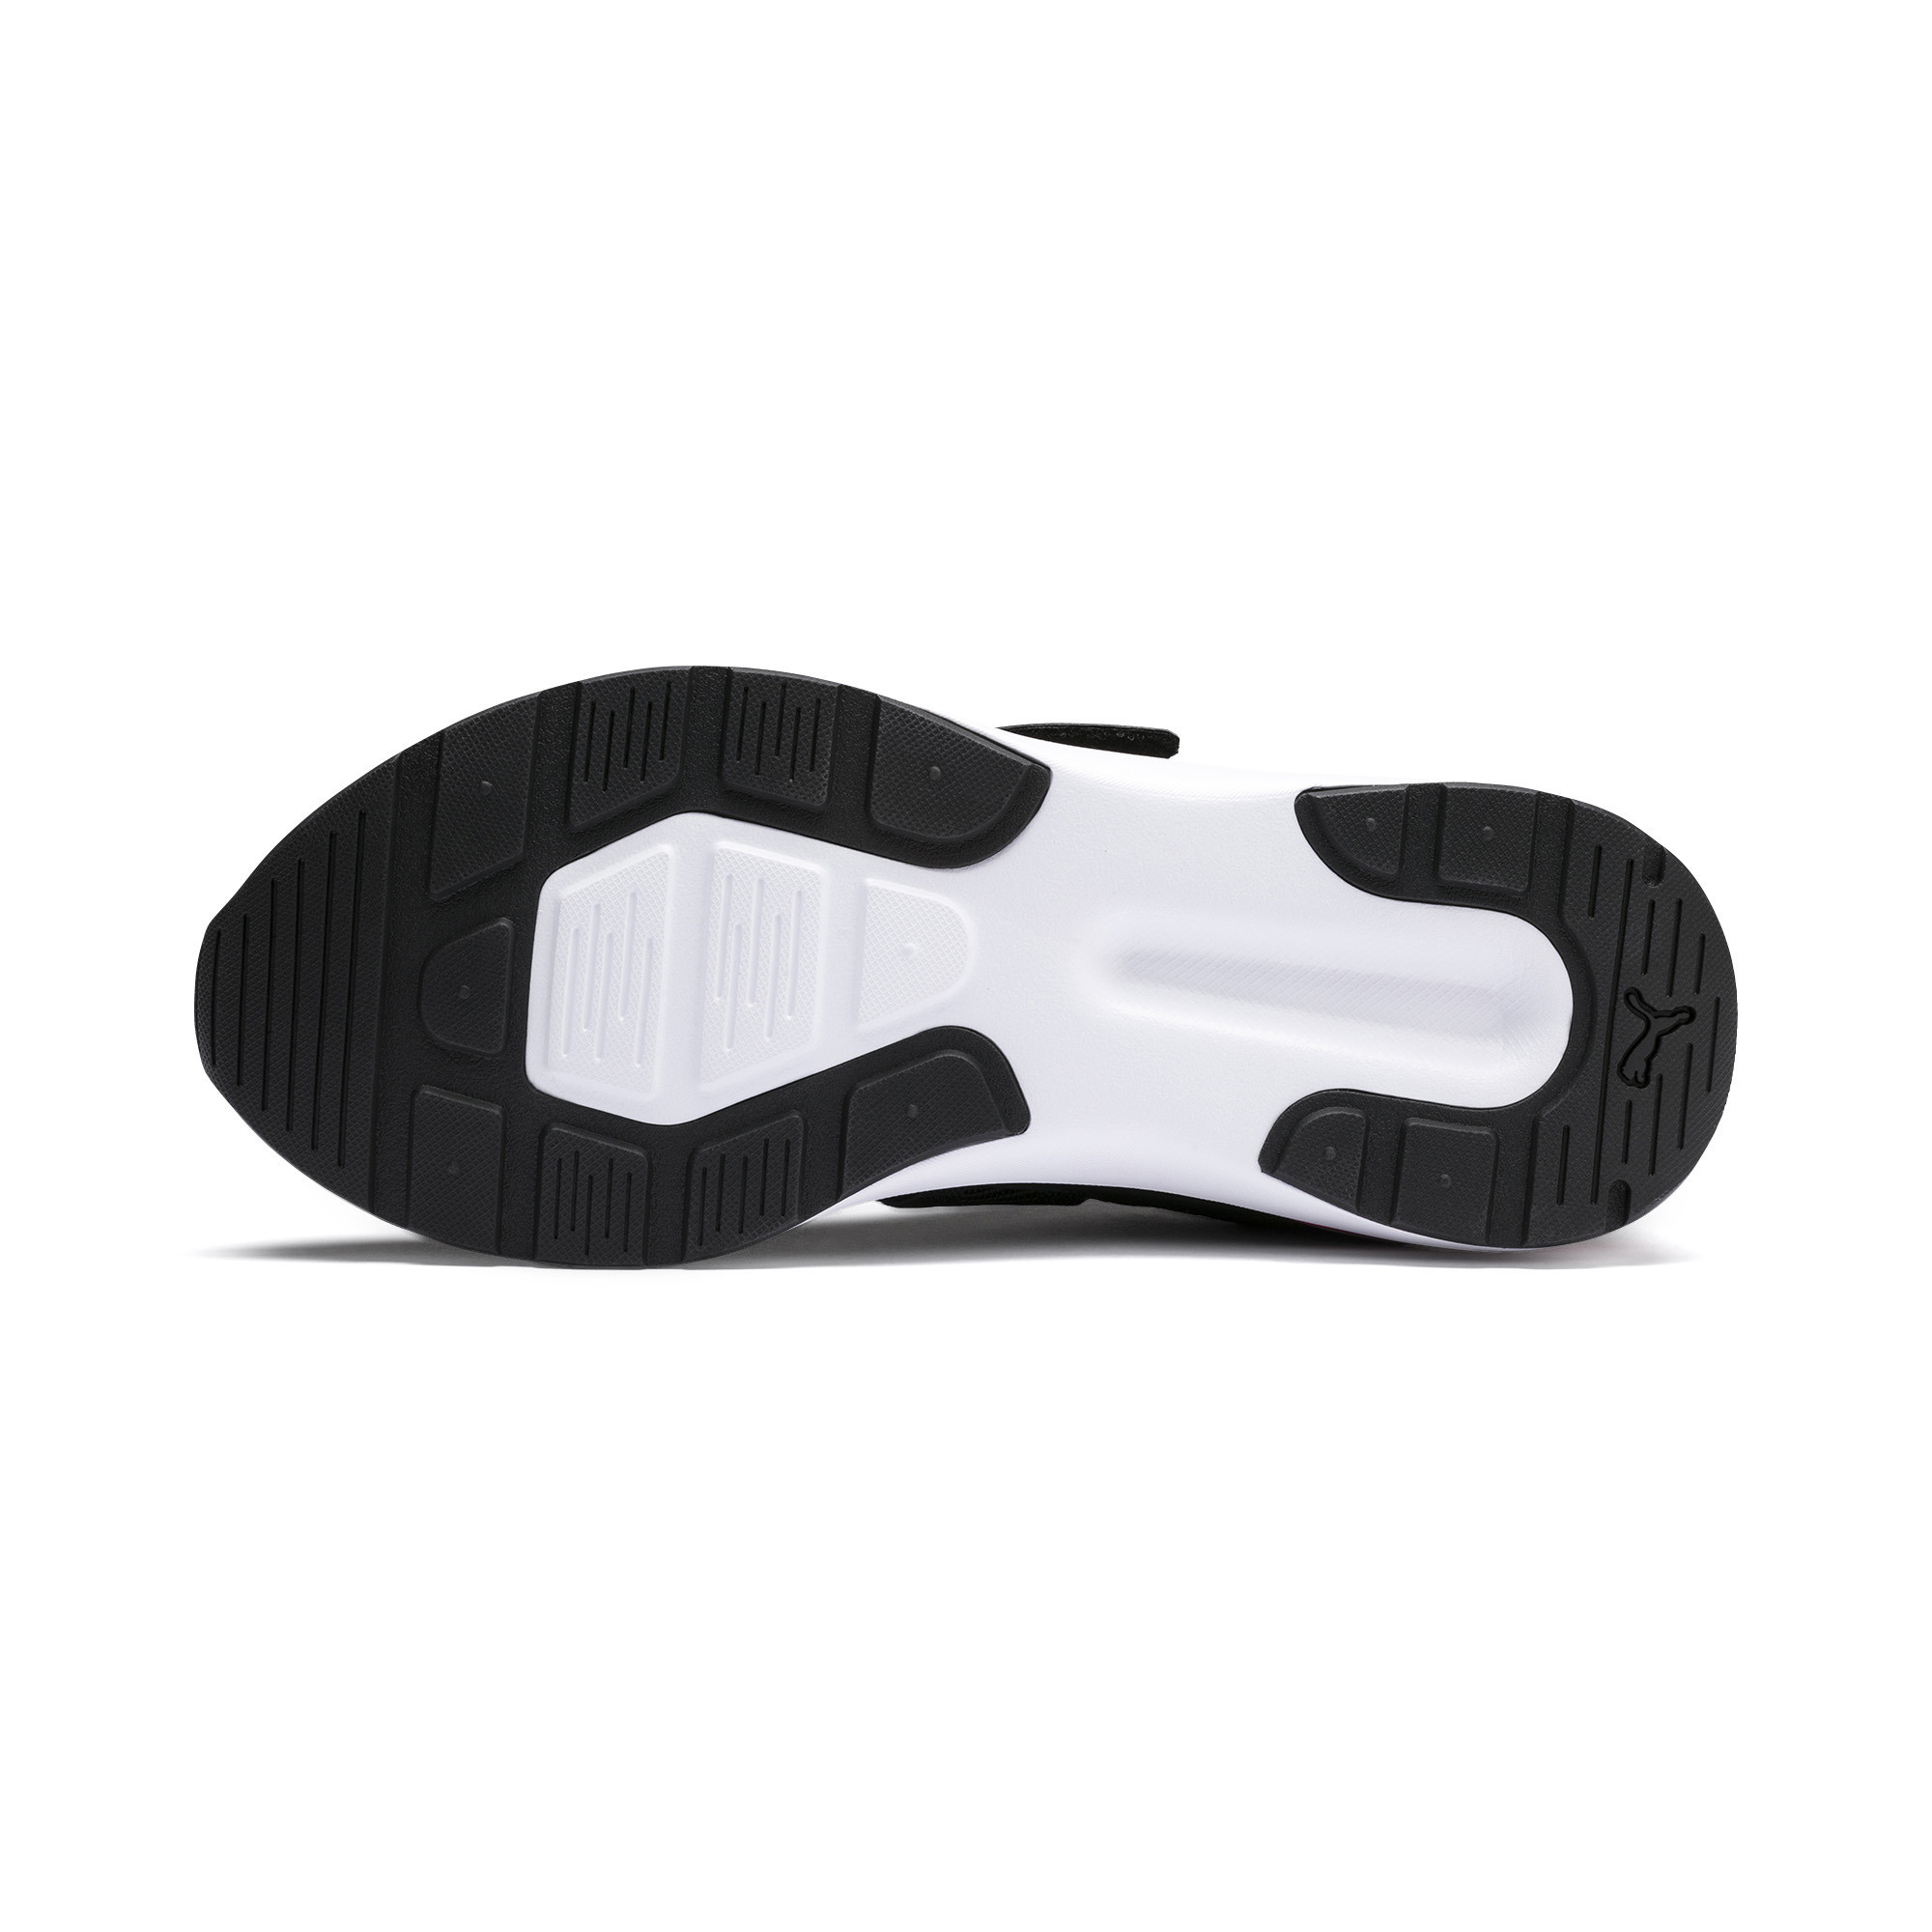 PUMA-Adela-X-Women-s-Sneakers-Women-Shoe-Basics thumbnail 10